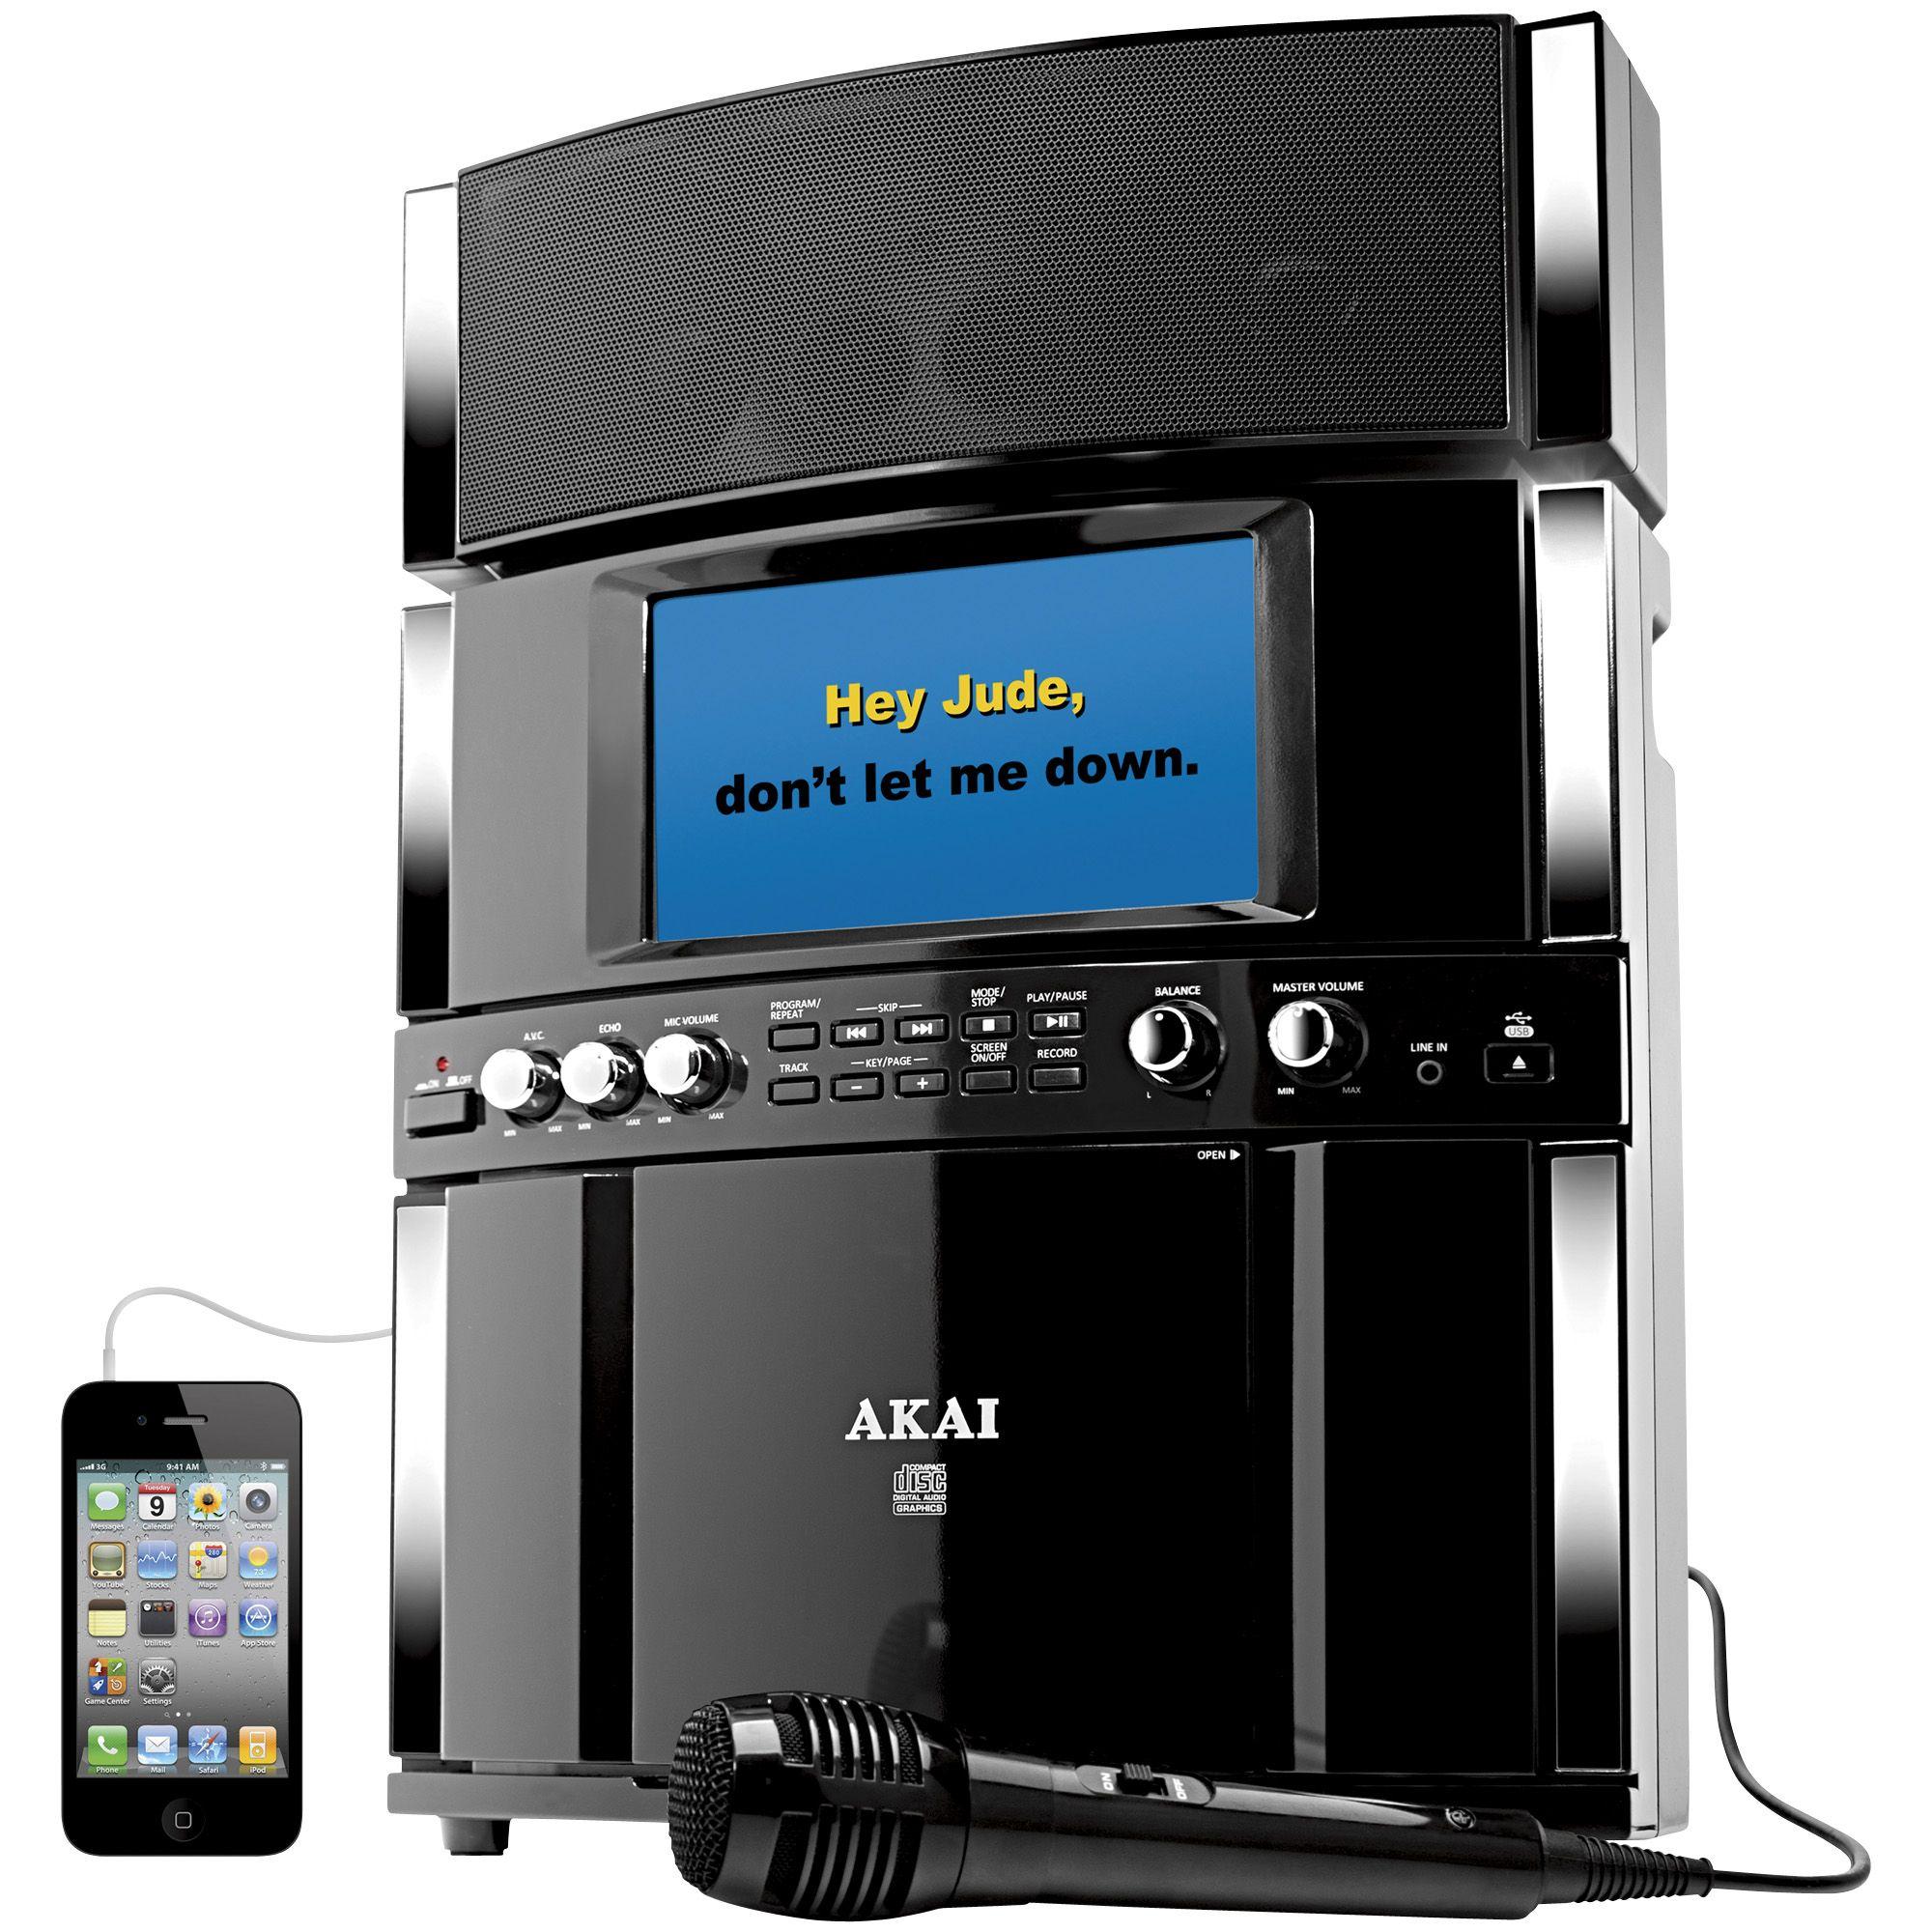 akai ks800 pro karaoke machine system with 7 screen ebay. Black Bedroom Furniture Sets. Home Design Ideas